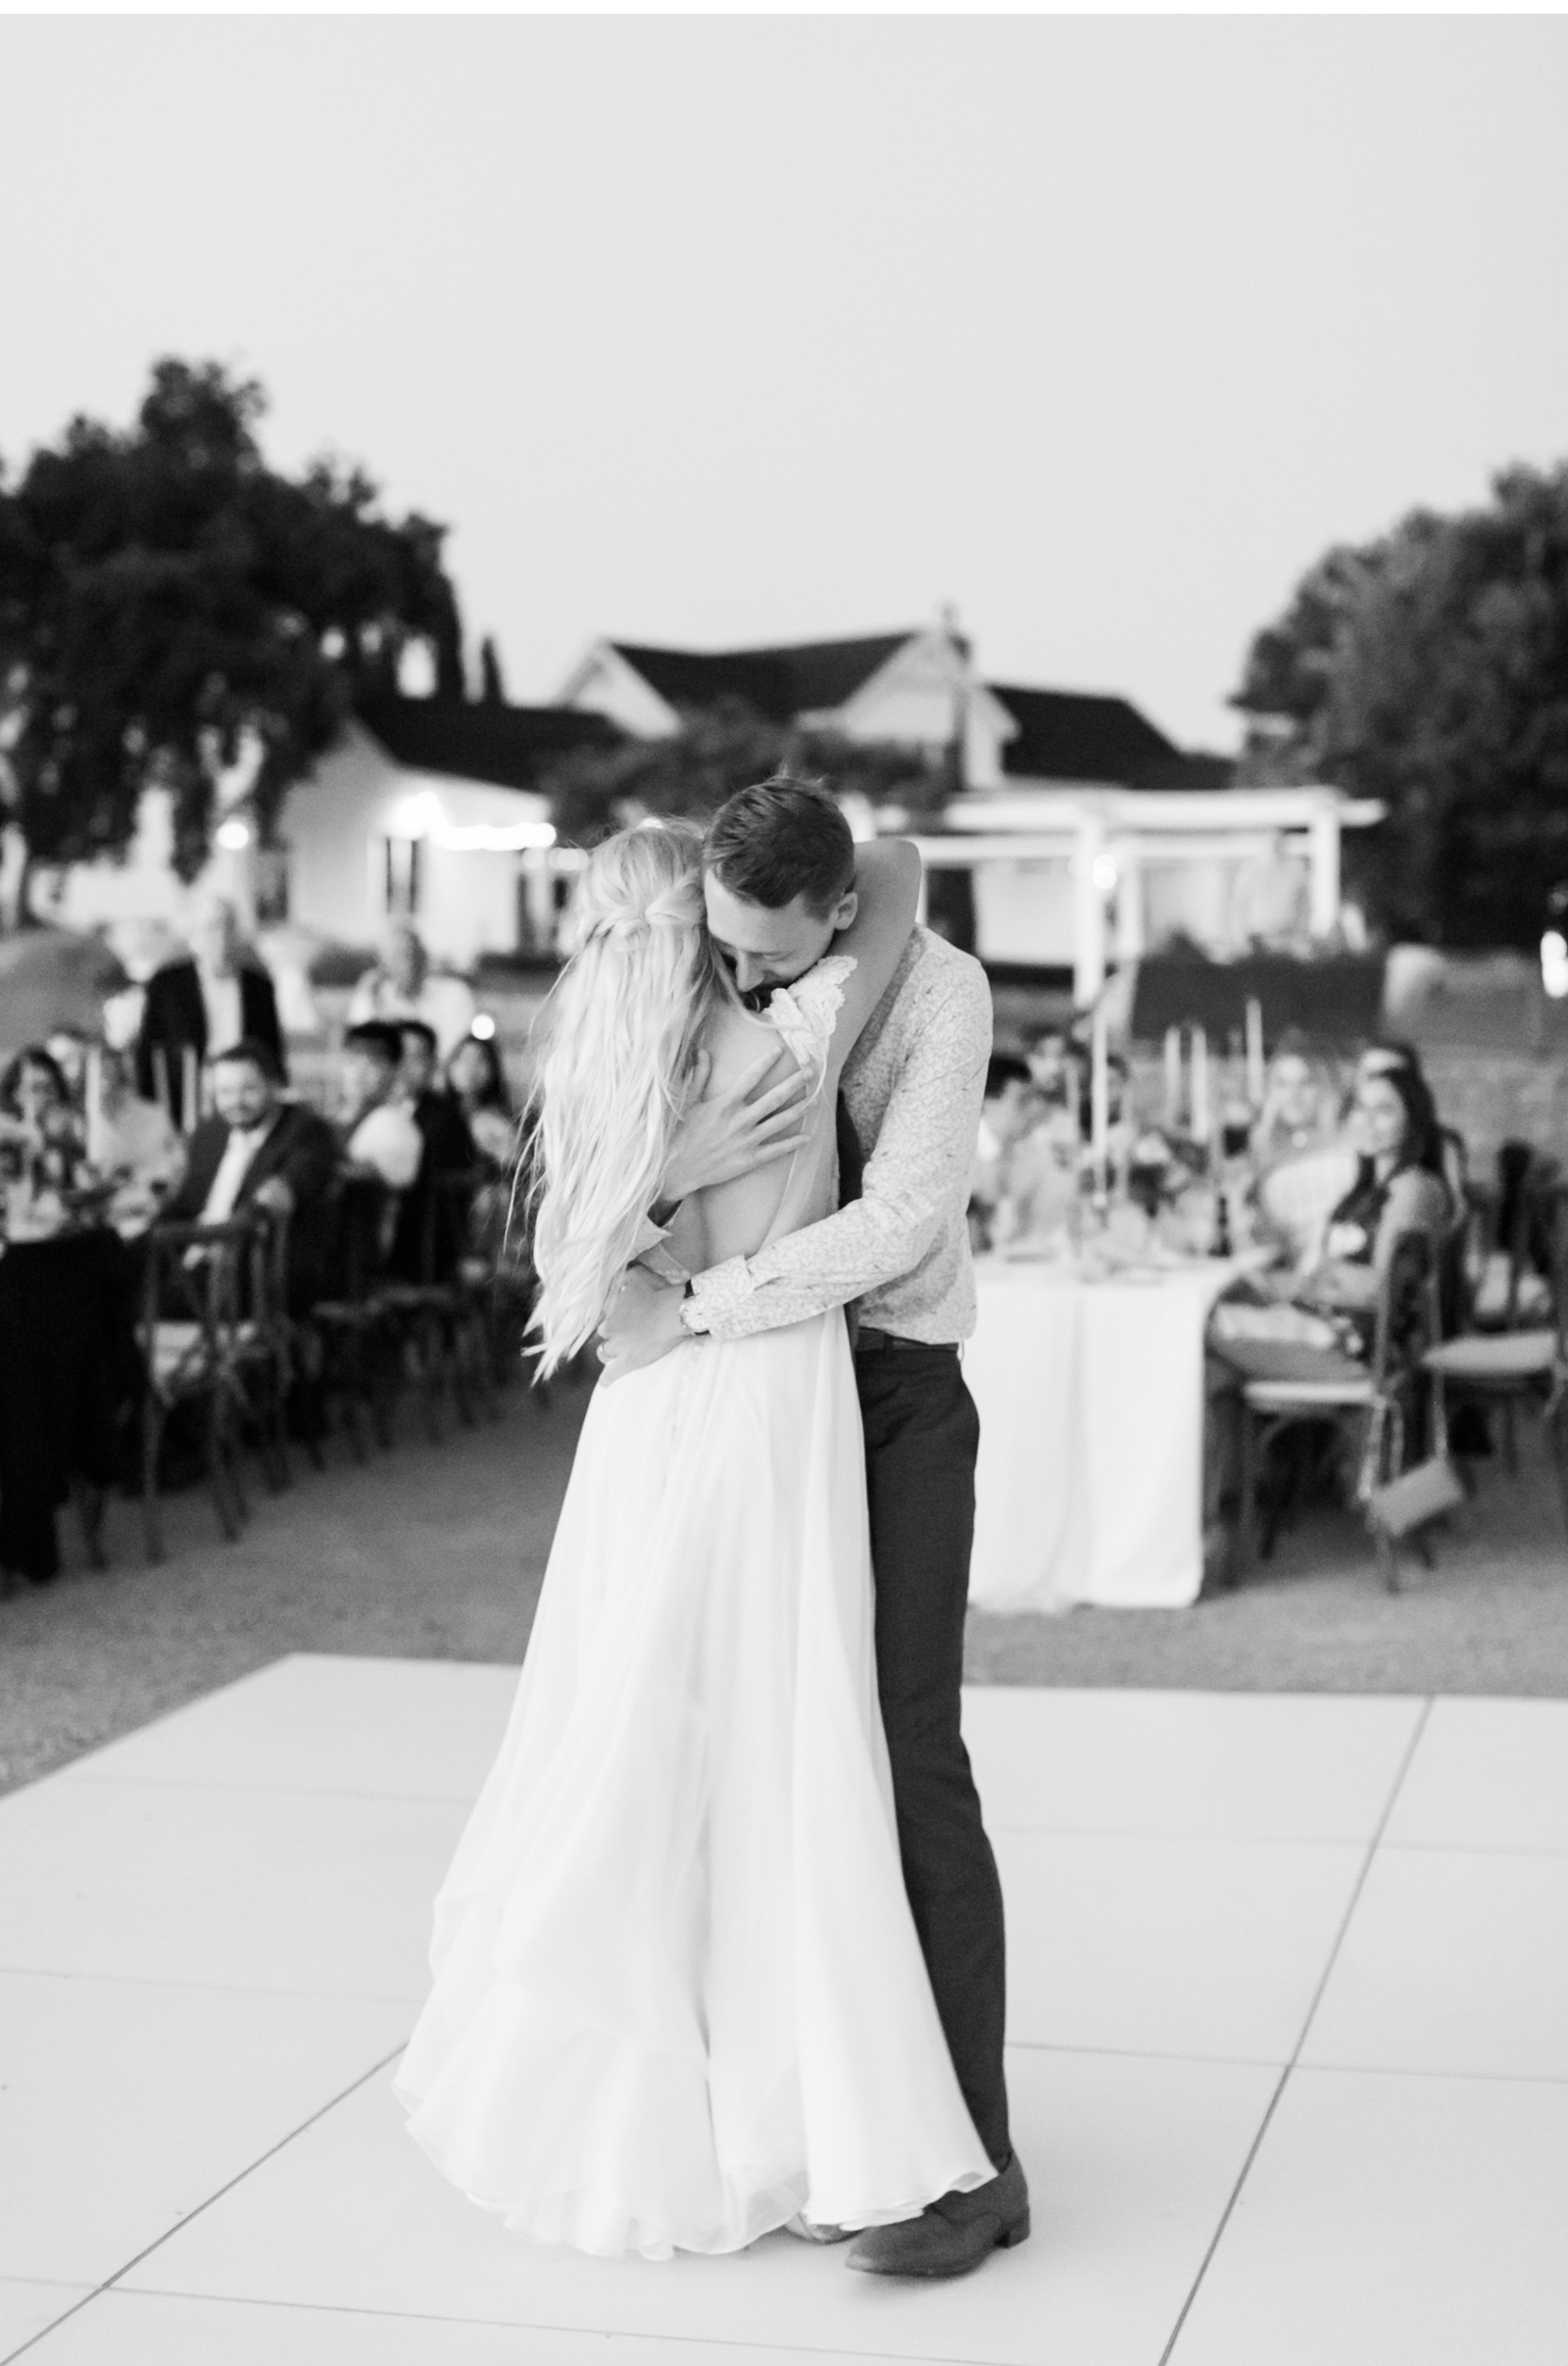 Style-Me-Pretty-California-Wedding-San-Luis-Obispo-Paso-Robles-Natalie-Schutt-Photography_03.jpg